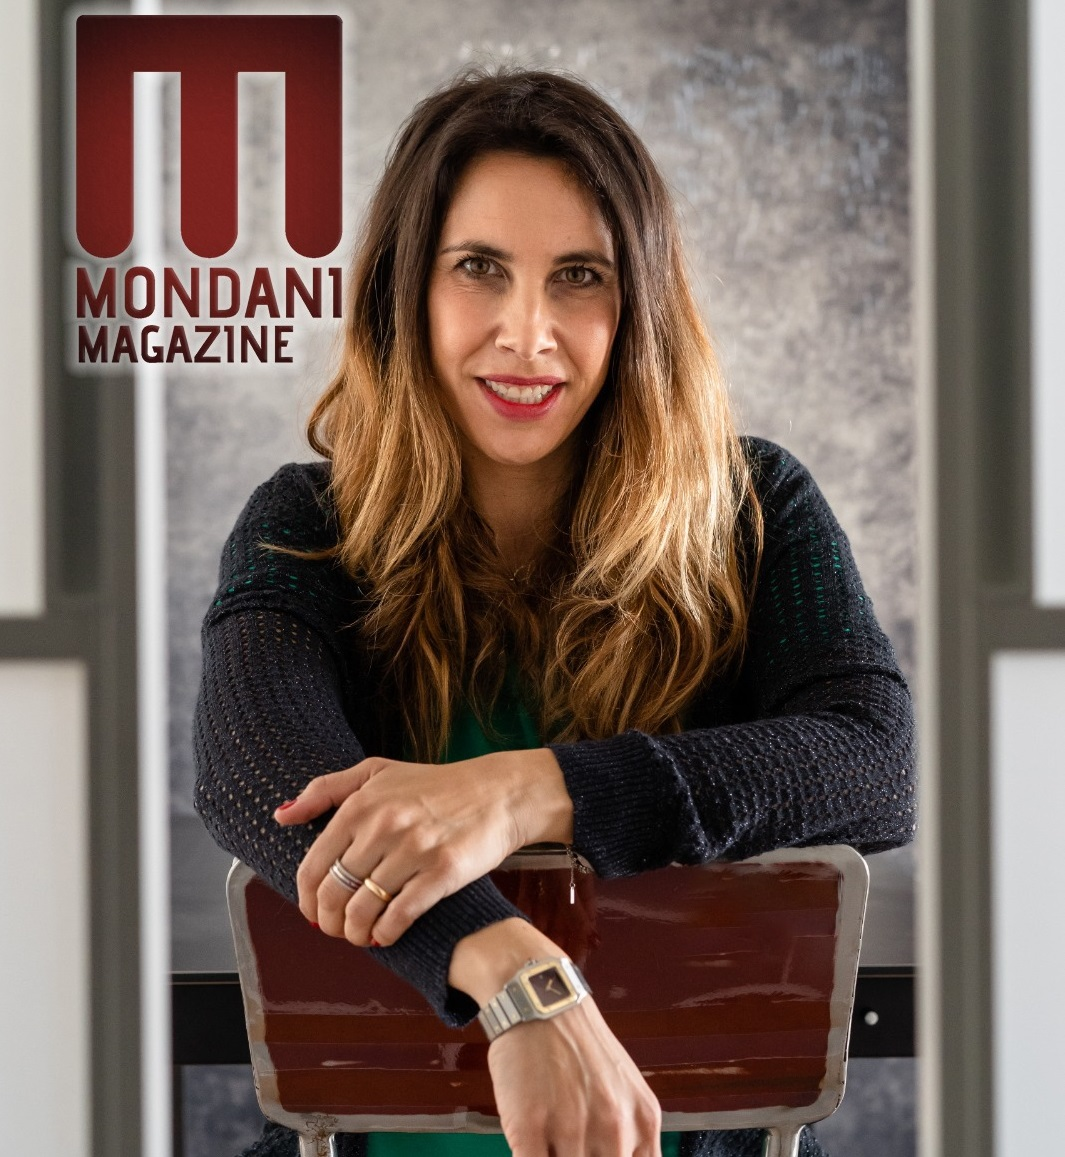 New Mondani Magazine out now! - MondaniWeb